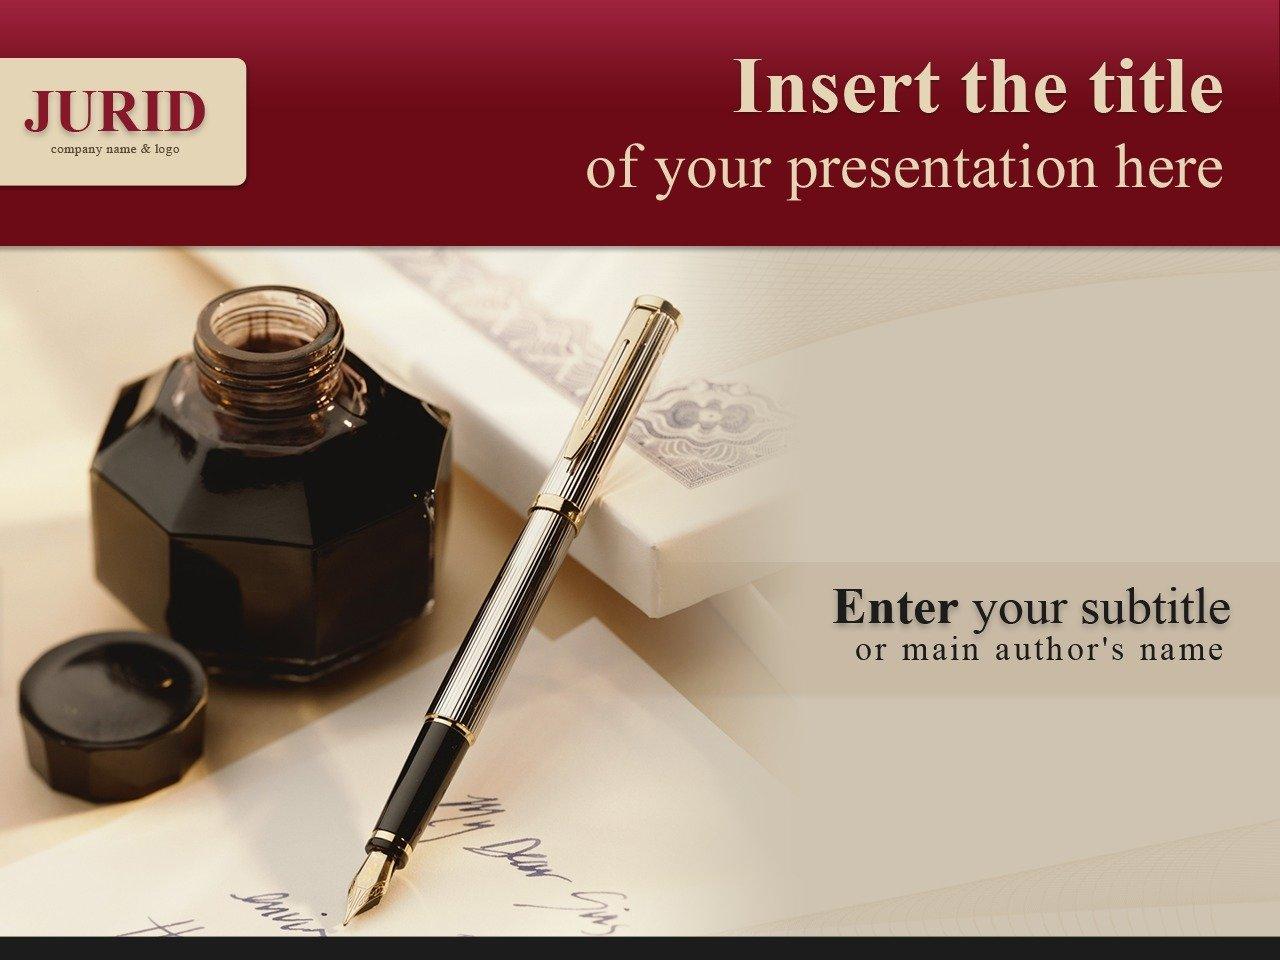 PowerPoint шаблон №25035 на тему юрист